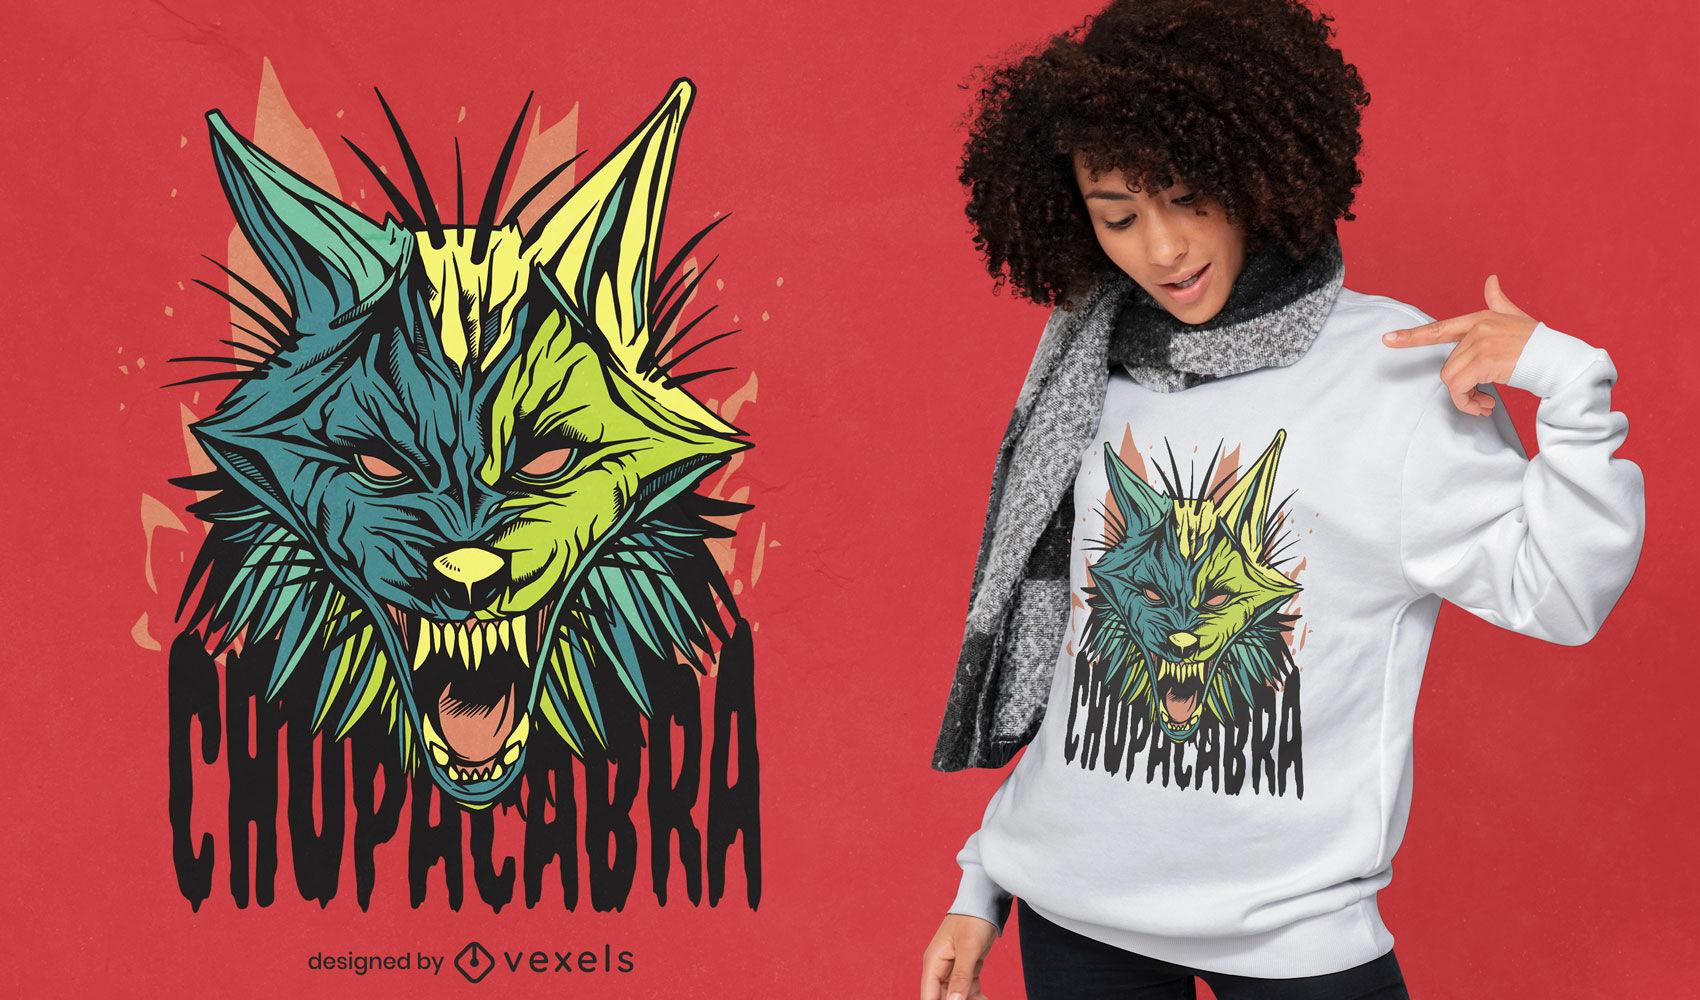 Angry chupacabra monster t-shirt design